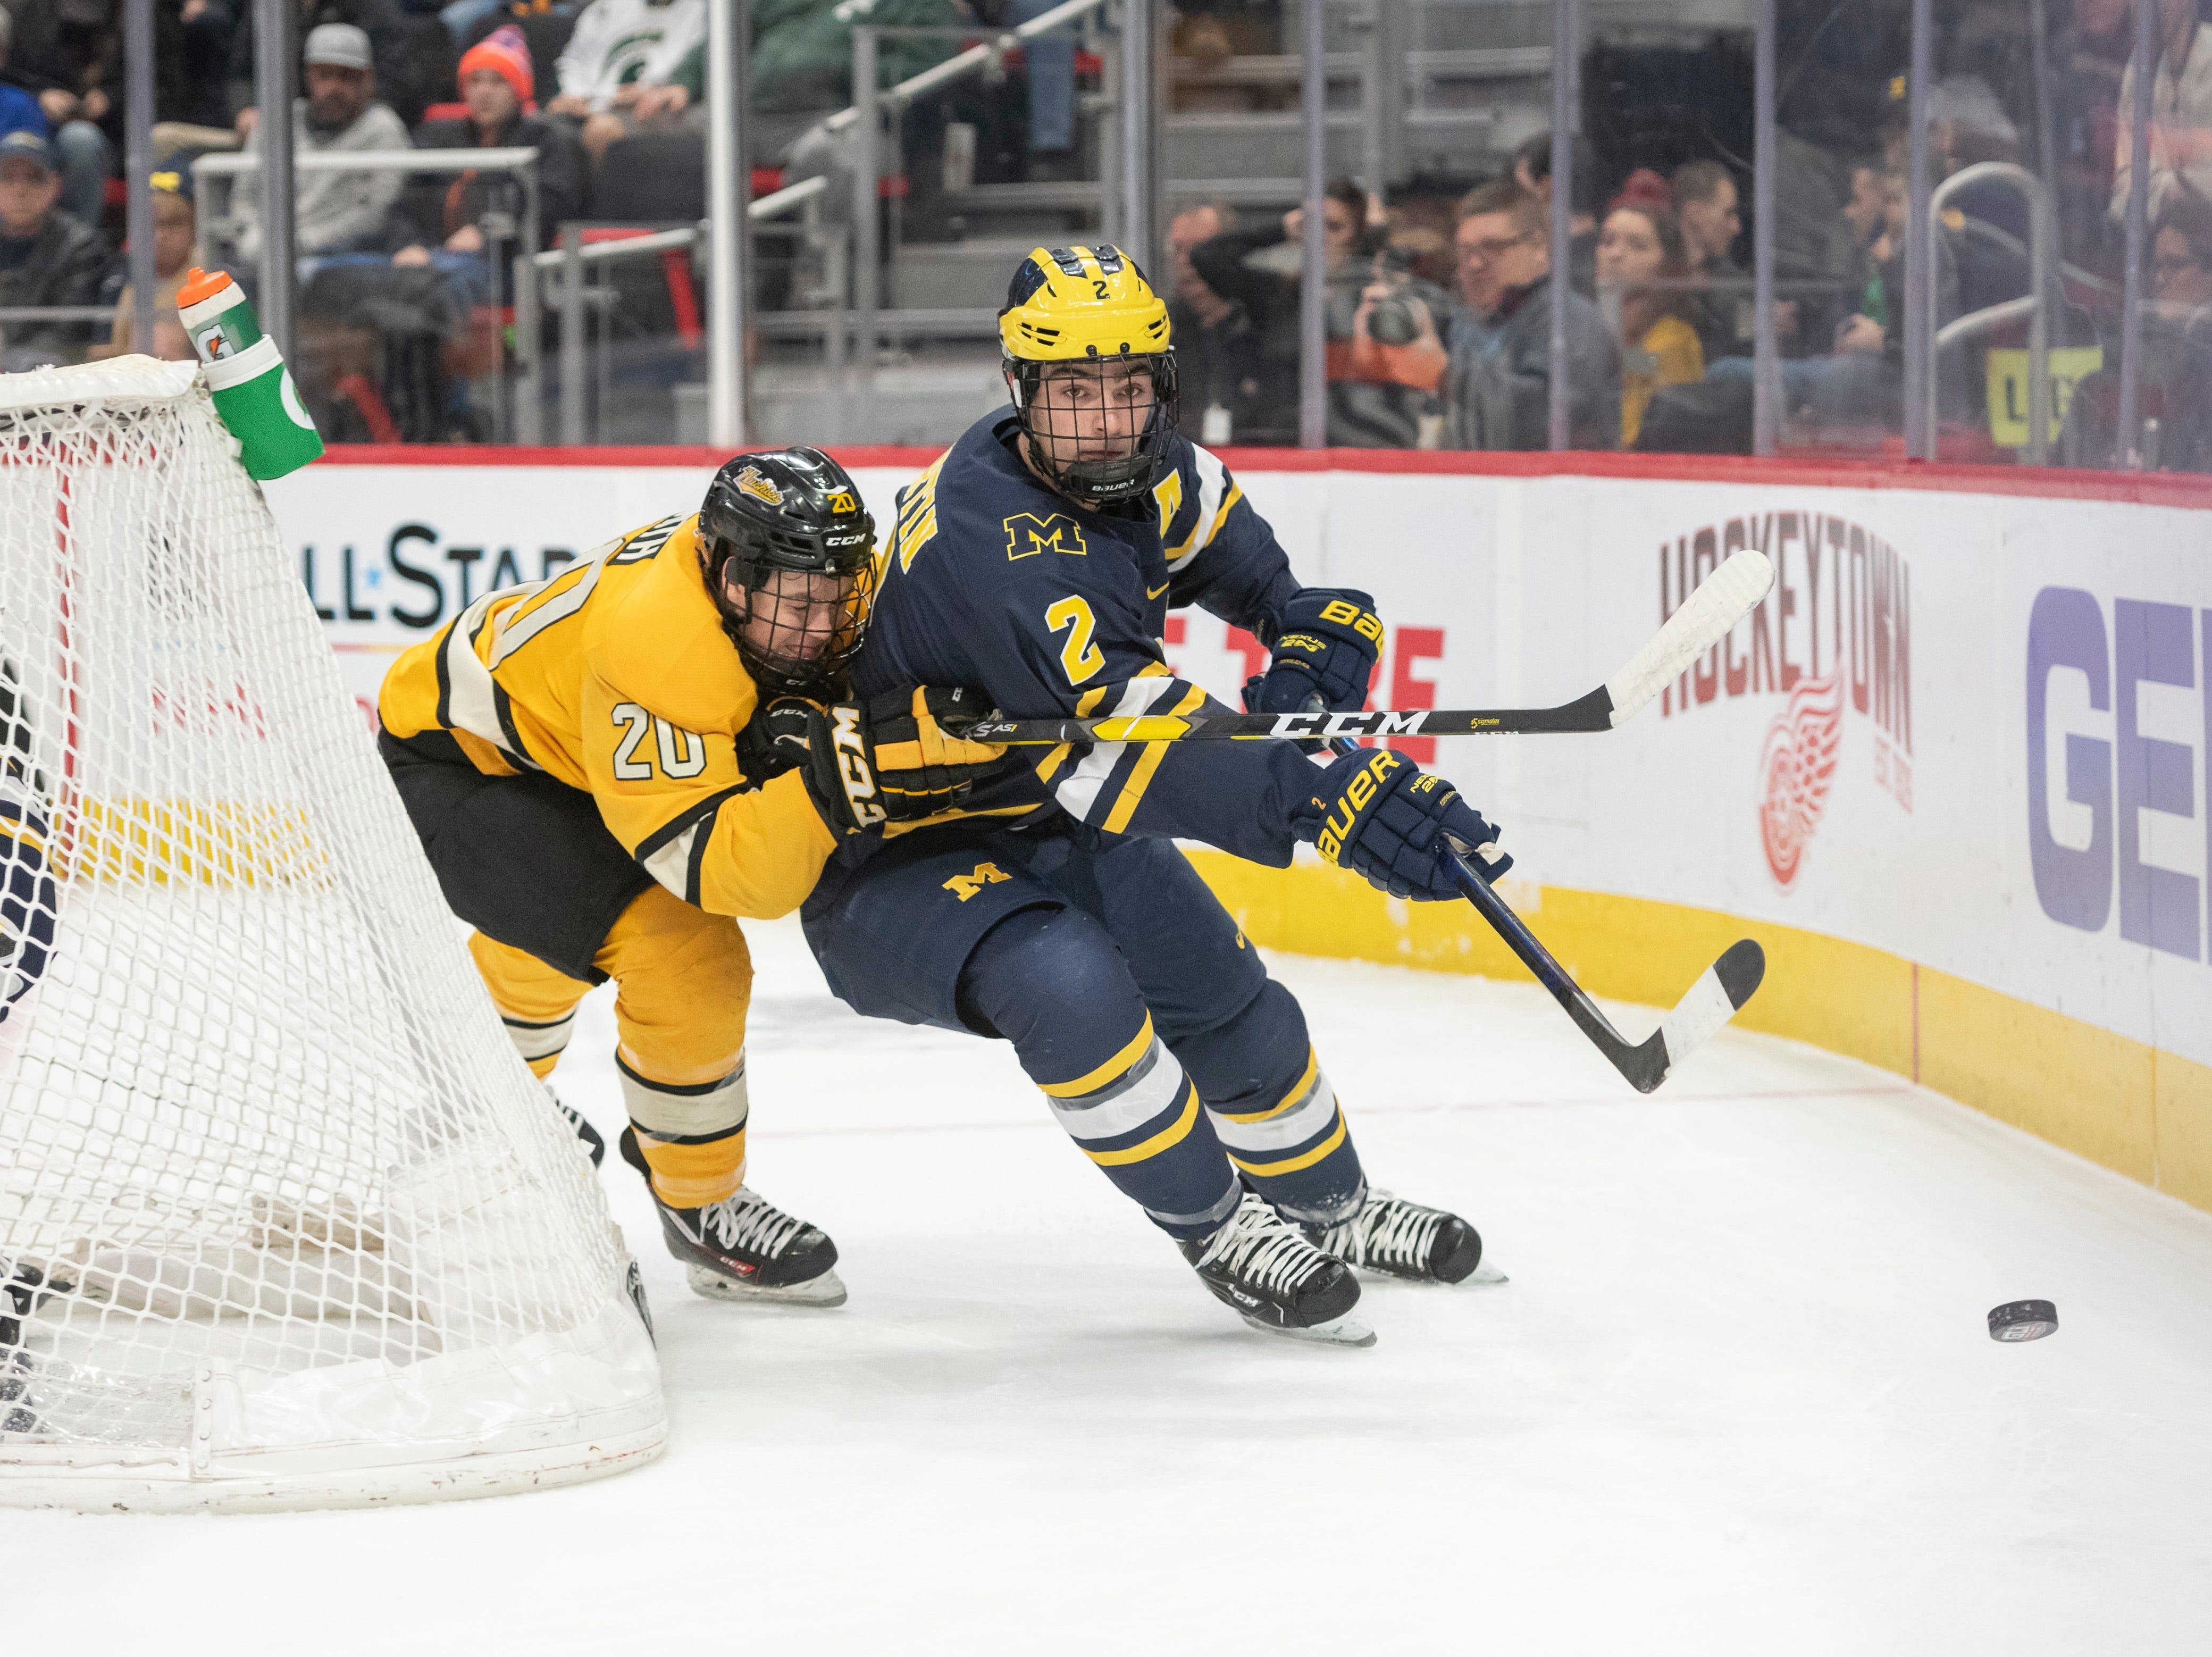 Michigan Tech forward Alex Smith and Michigan defenseman Luke Martin battle for the puck in the first period.